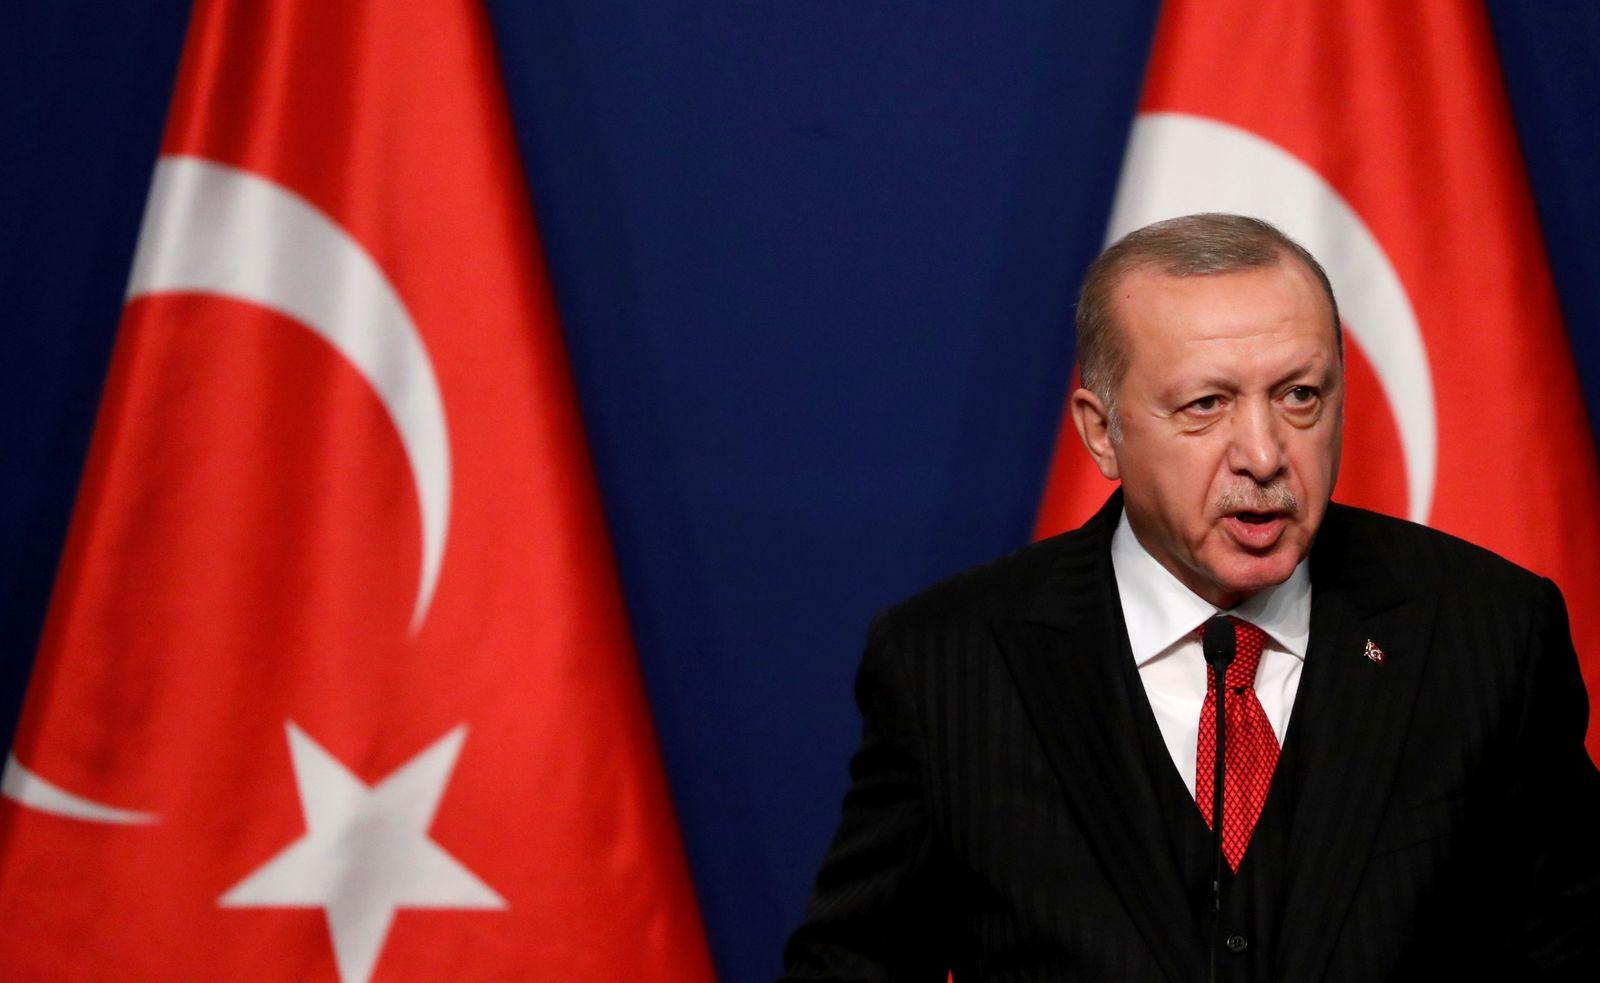 FILE PHOTO: Turkish President Recep Tayyip Erdogan visits Hungary